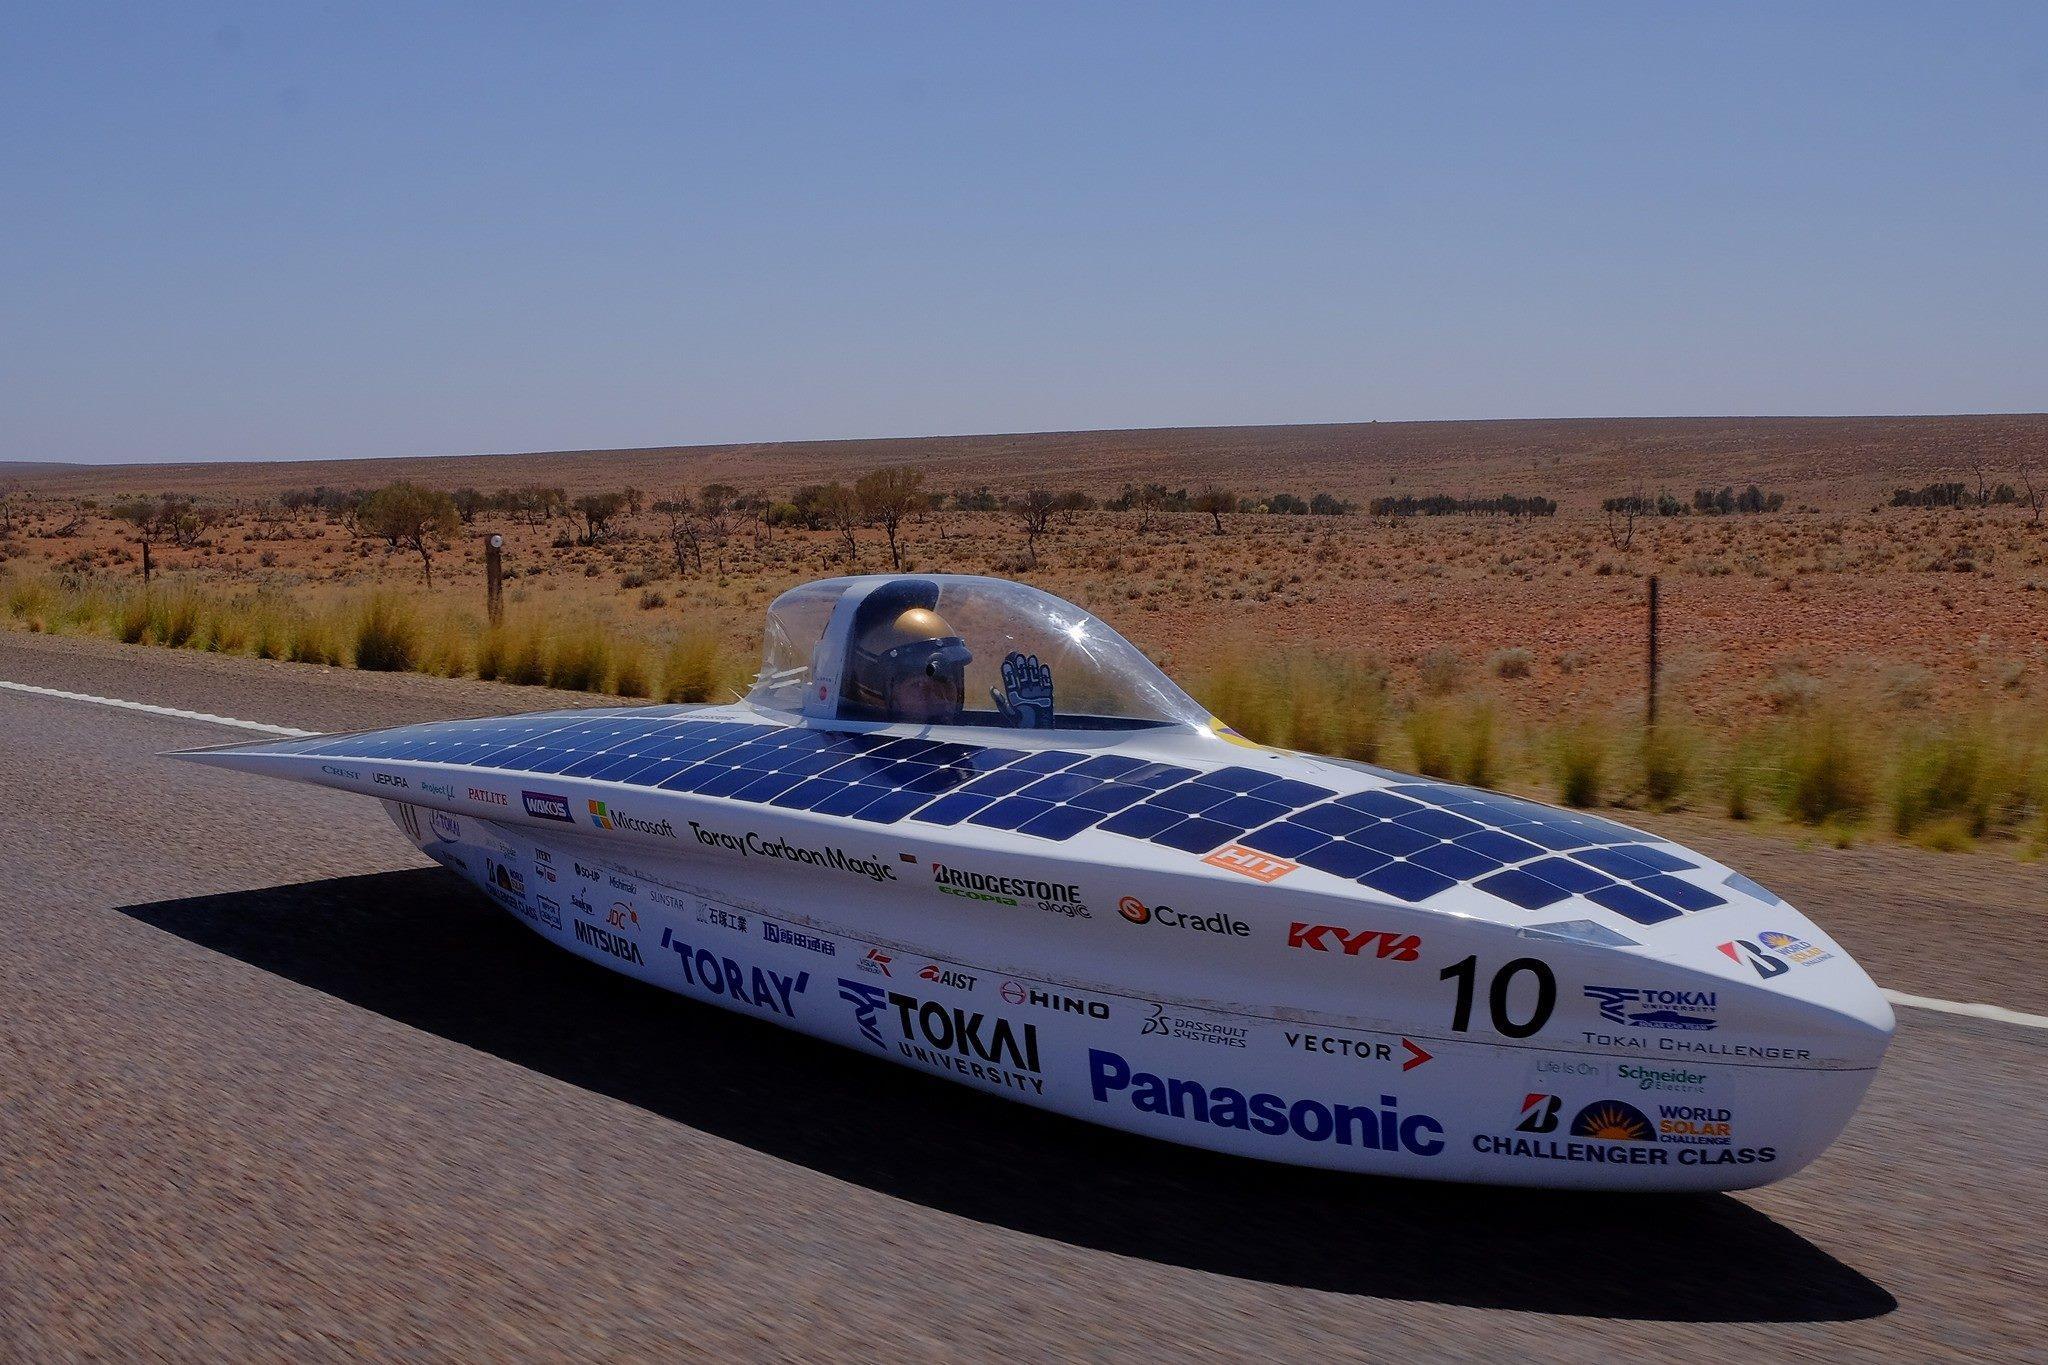 photo: The solar car using HIT